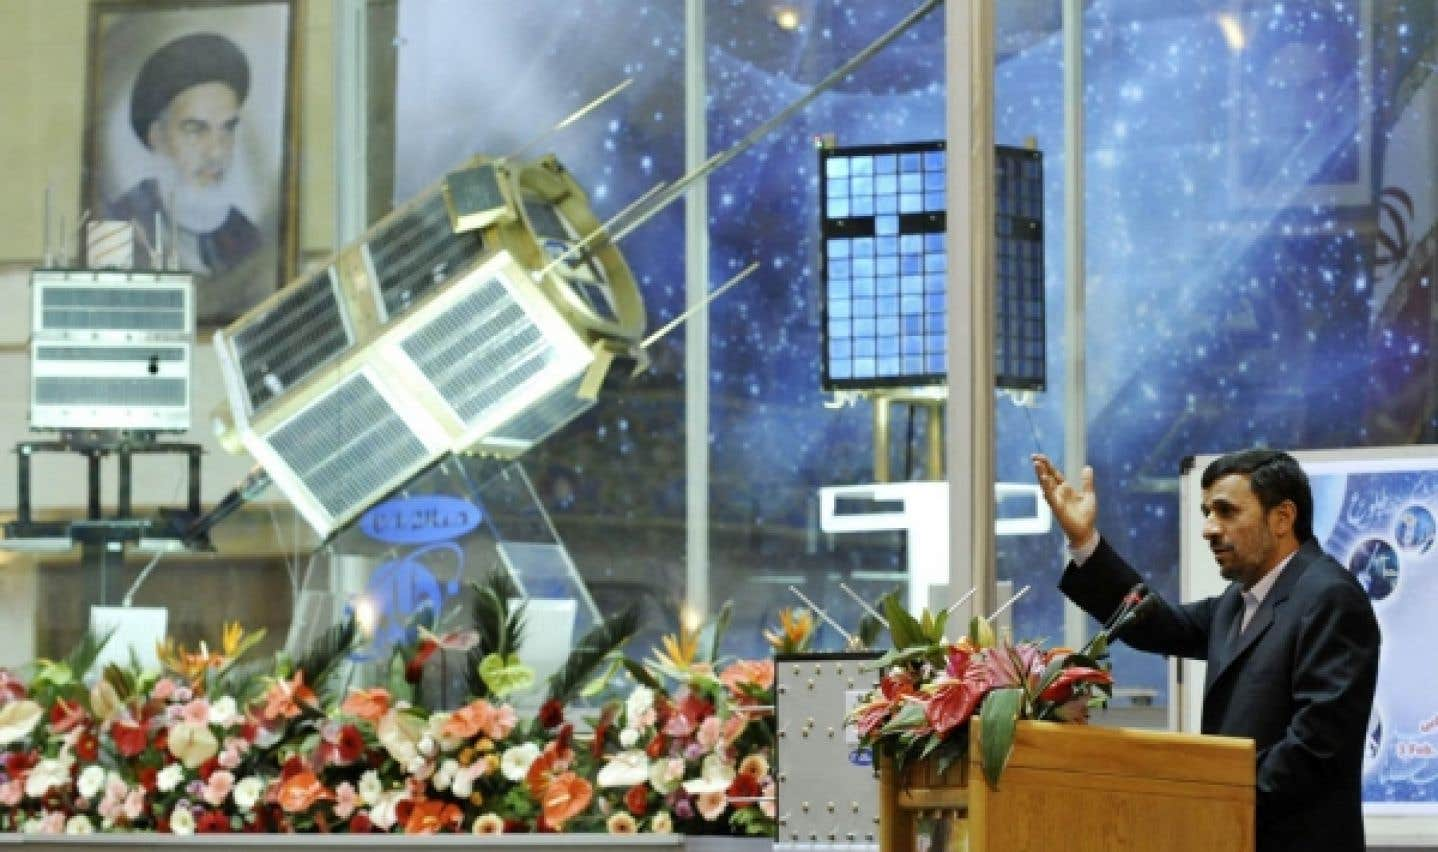 Téhéran reprend son jeu de cache-cache